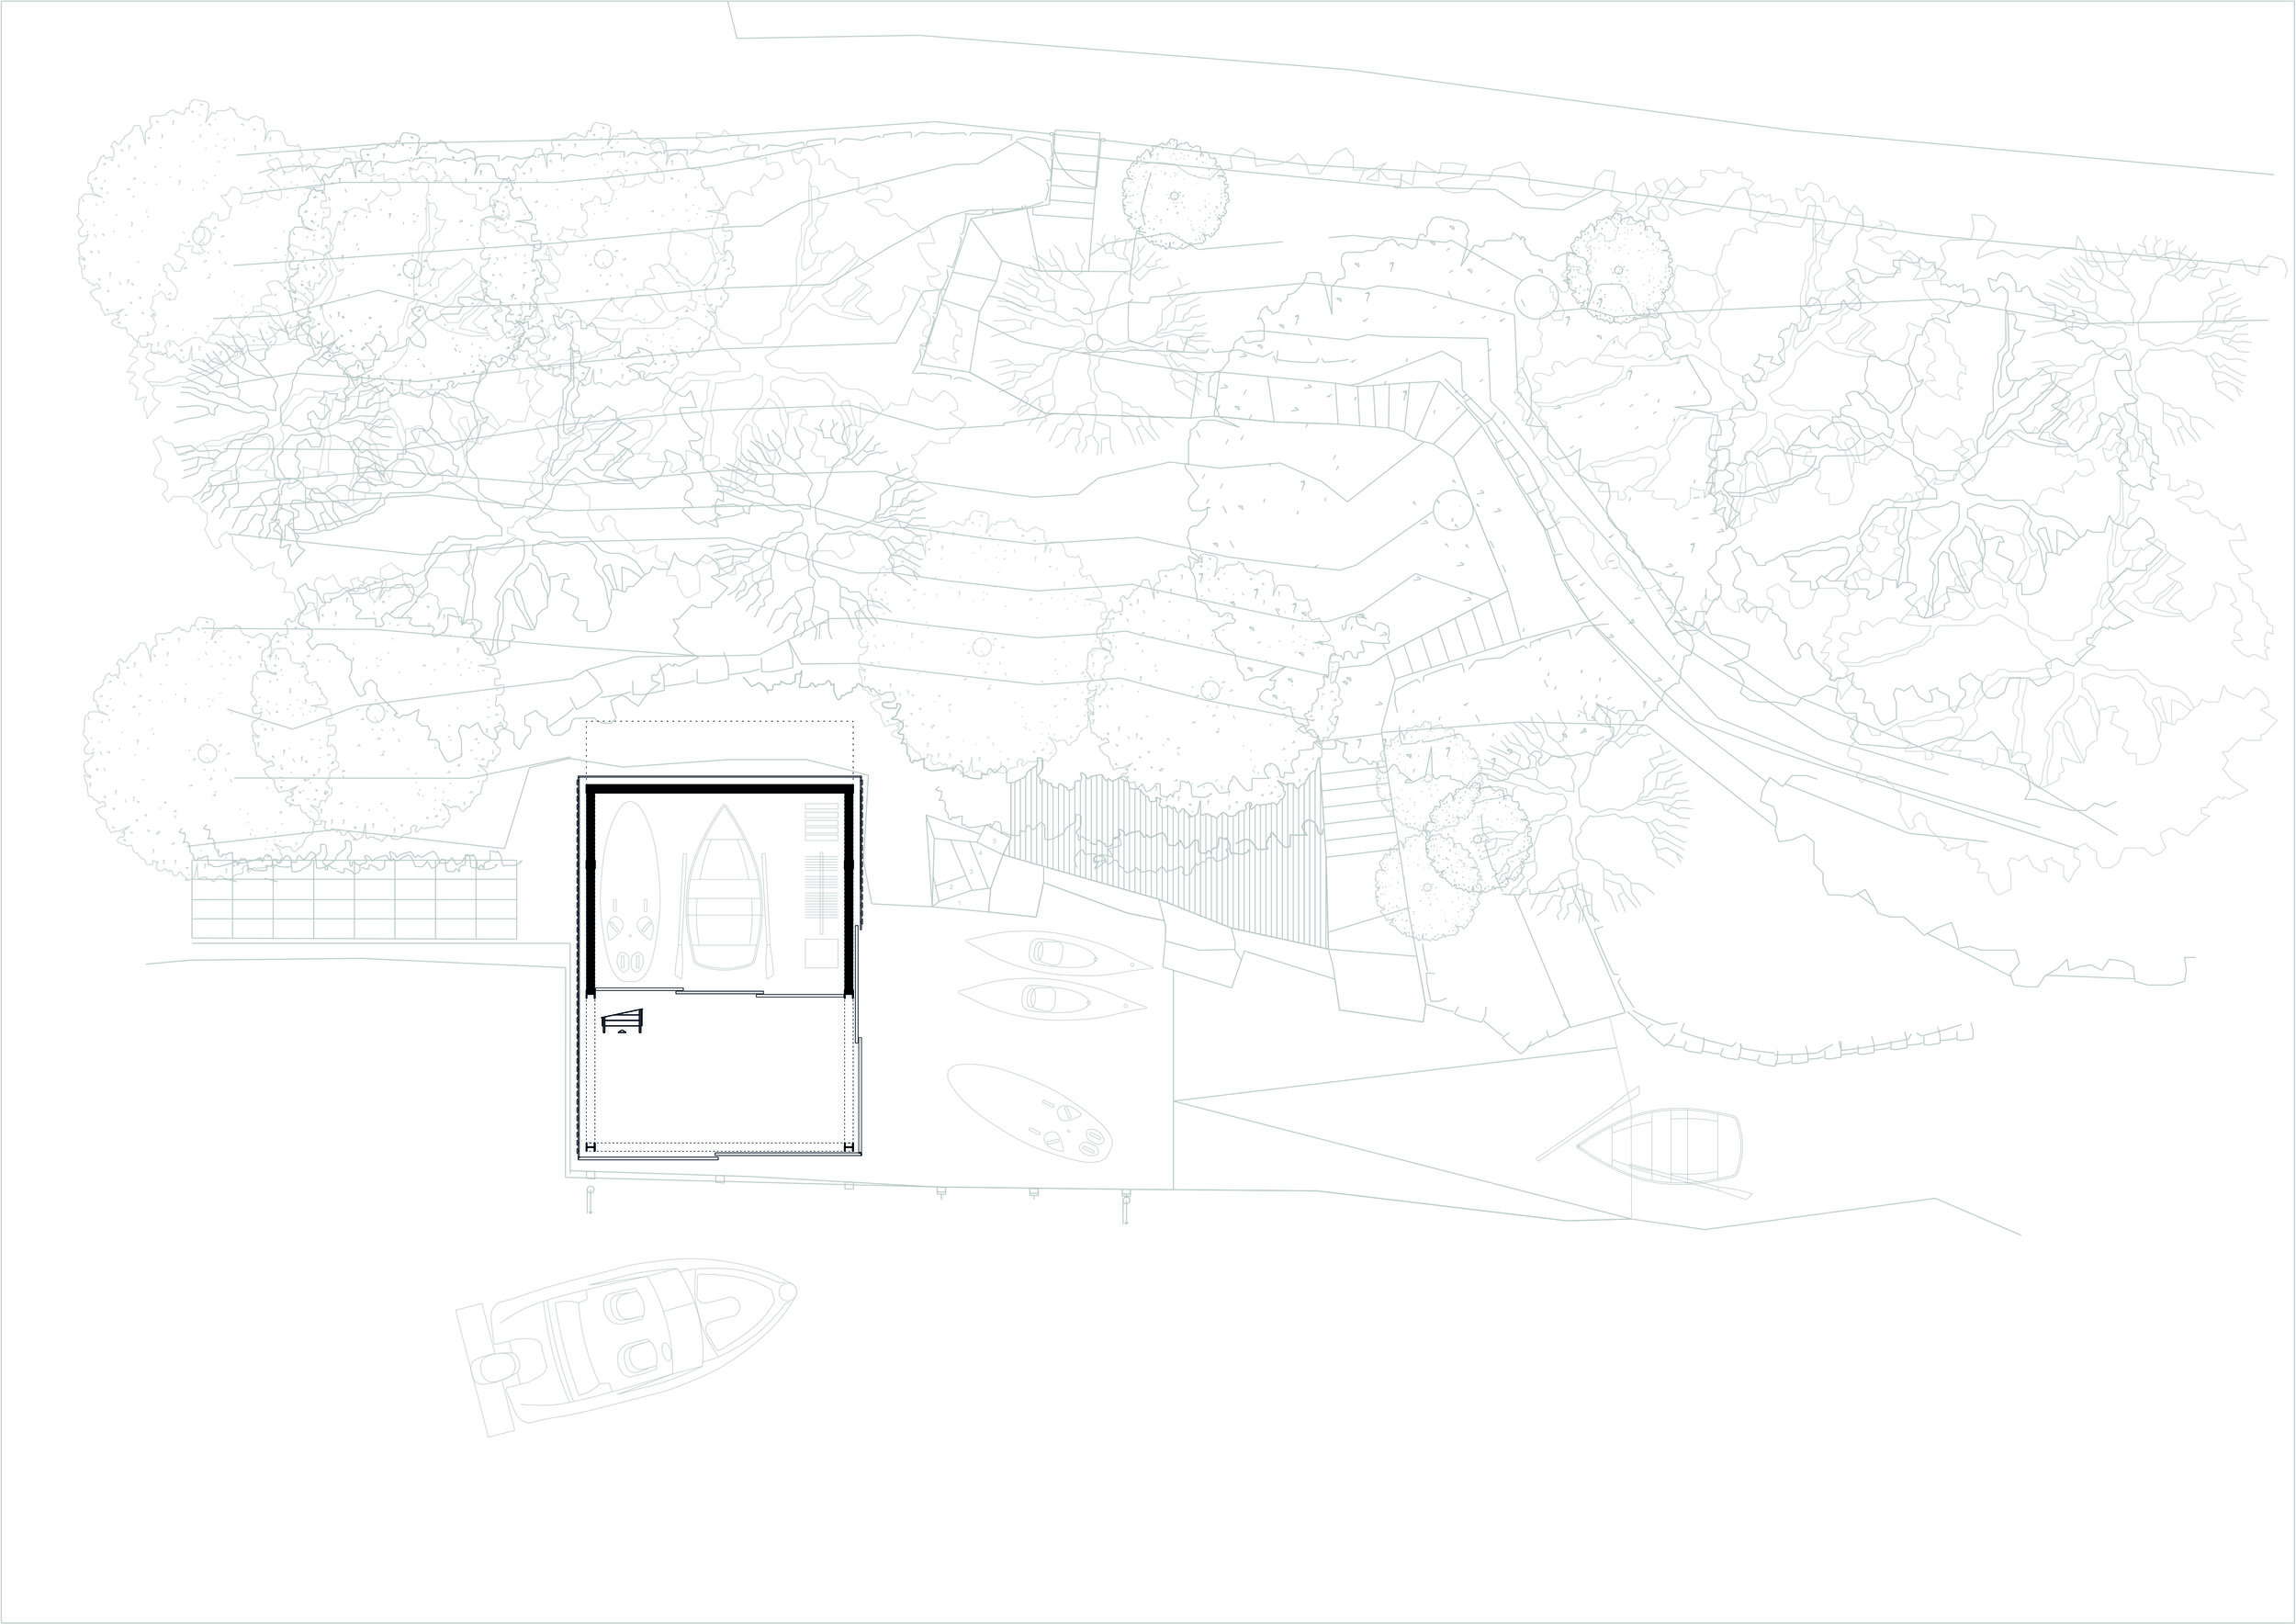 Boathouse-Ground Floor Plan-100A3.jpg